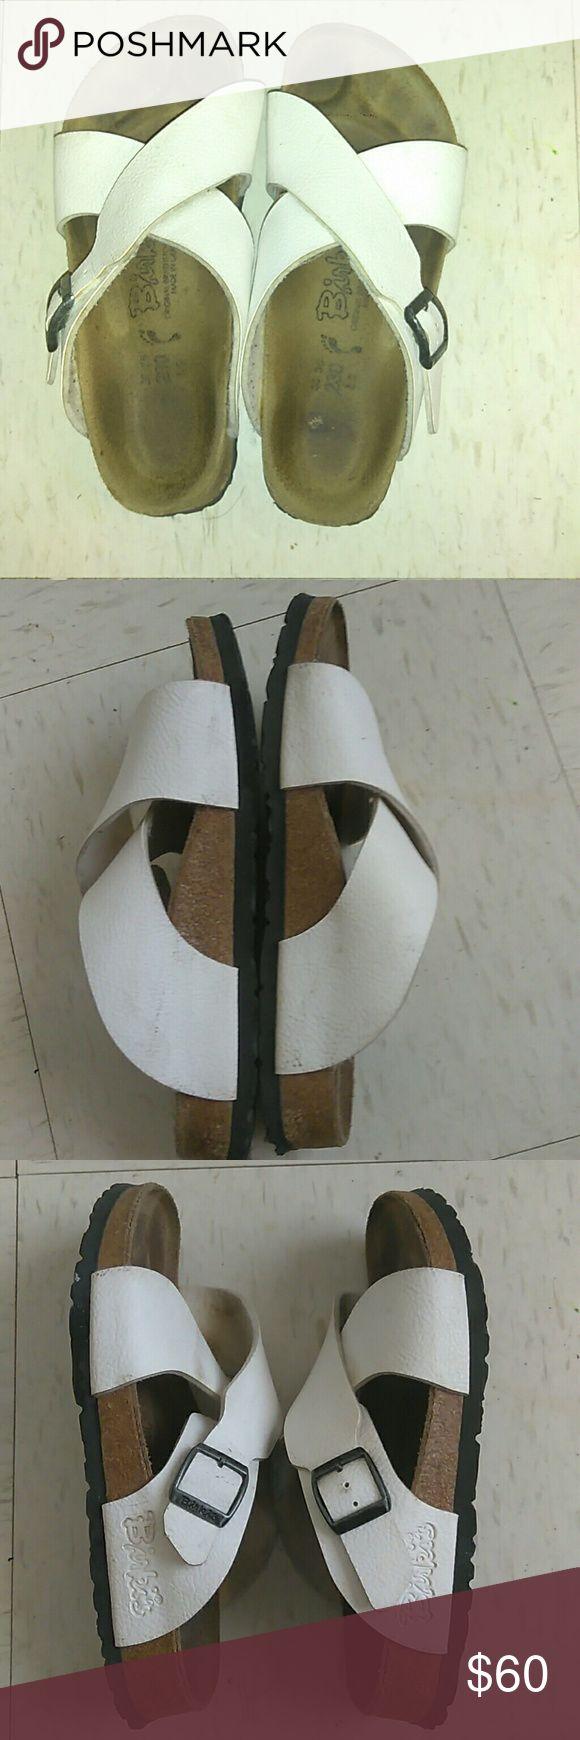 White birkis $60 obo Women's Birkenstock BIRKI'S 36/35 Sandal Cross Strap with Buckle Birkenstock Shoes Sandals